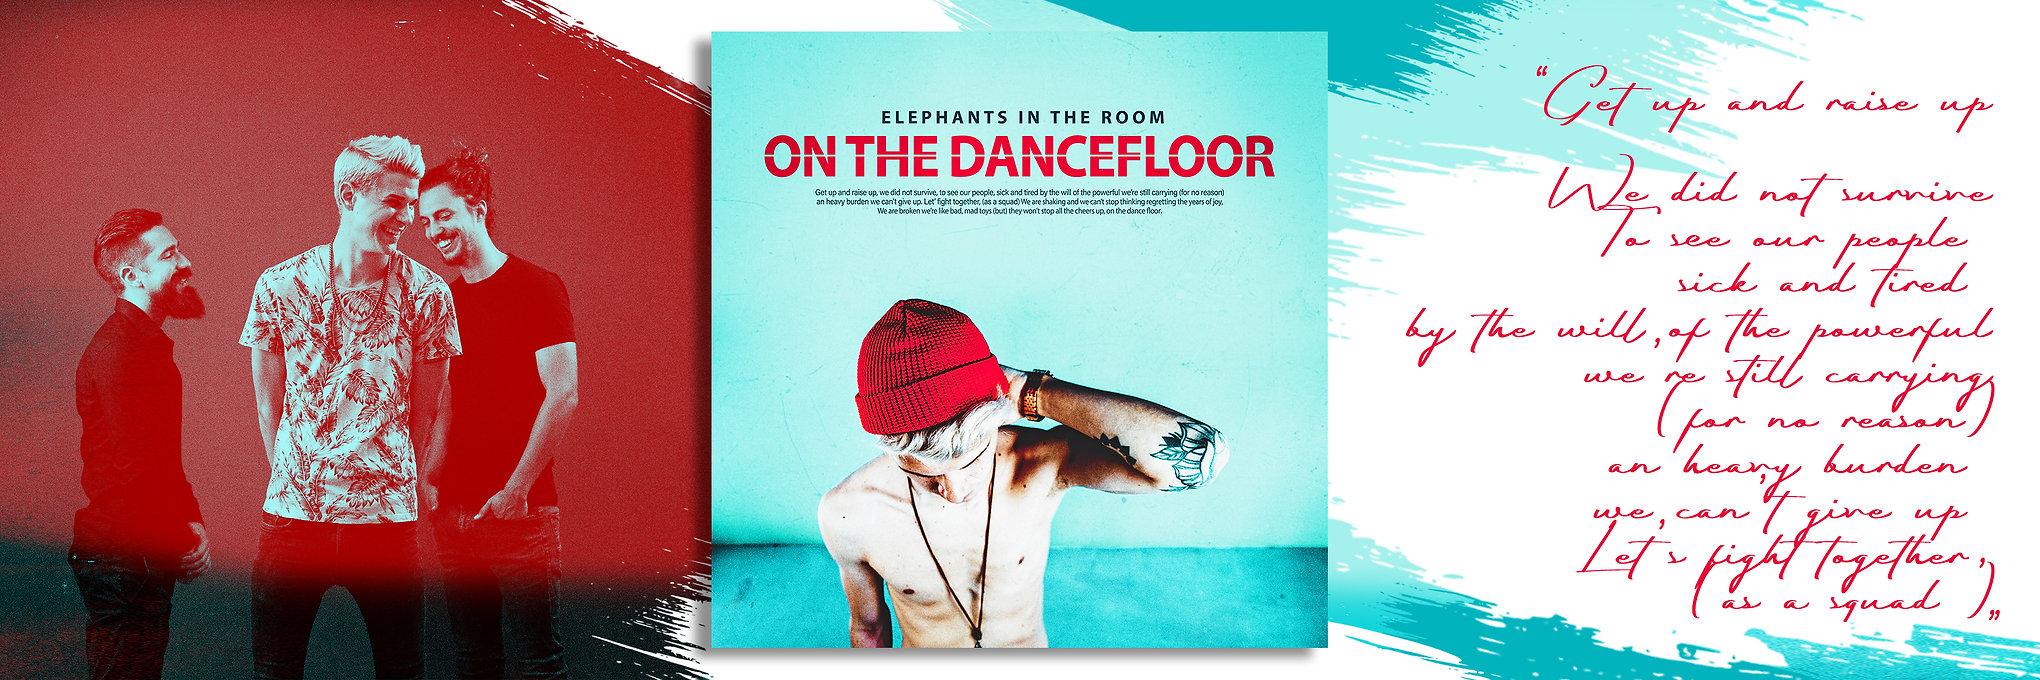 Elephants in the Room - On the Dancefloor